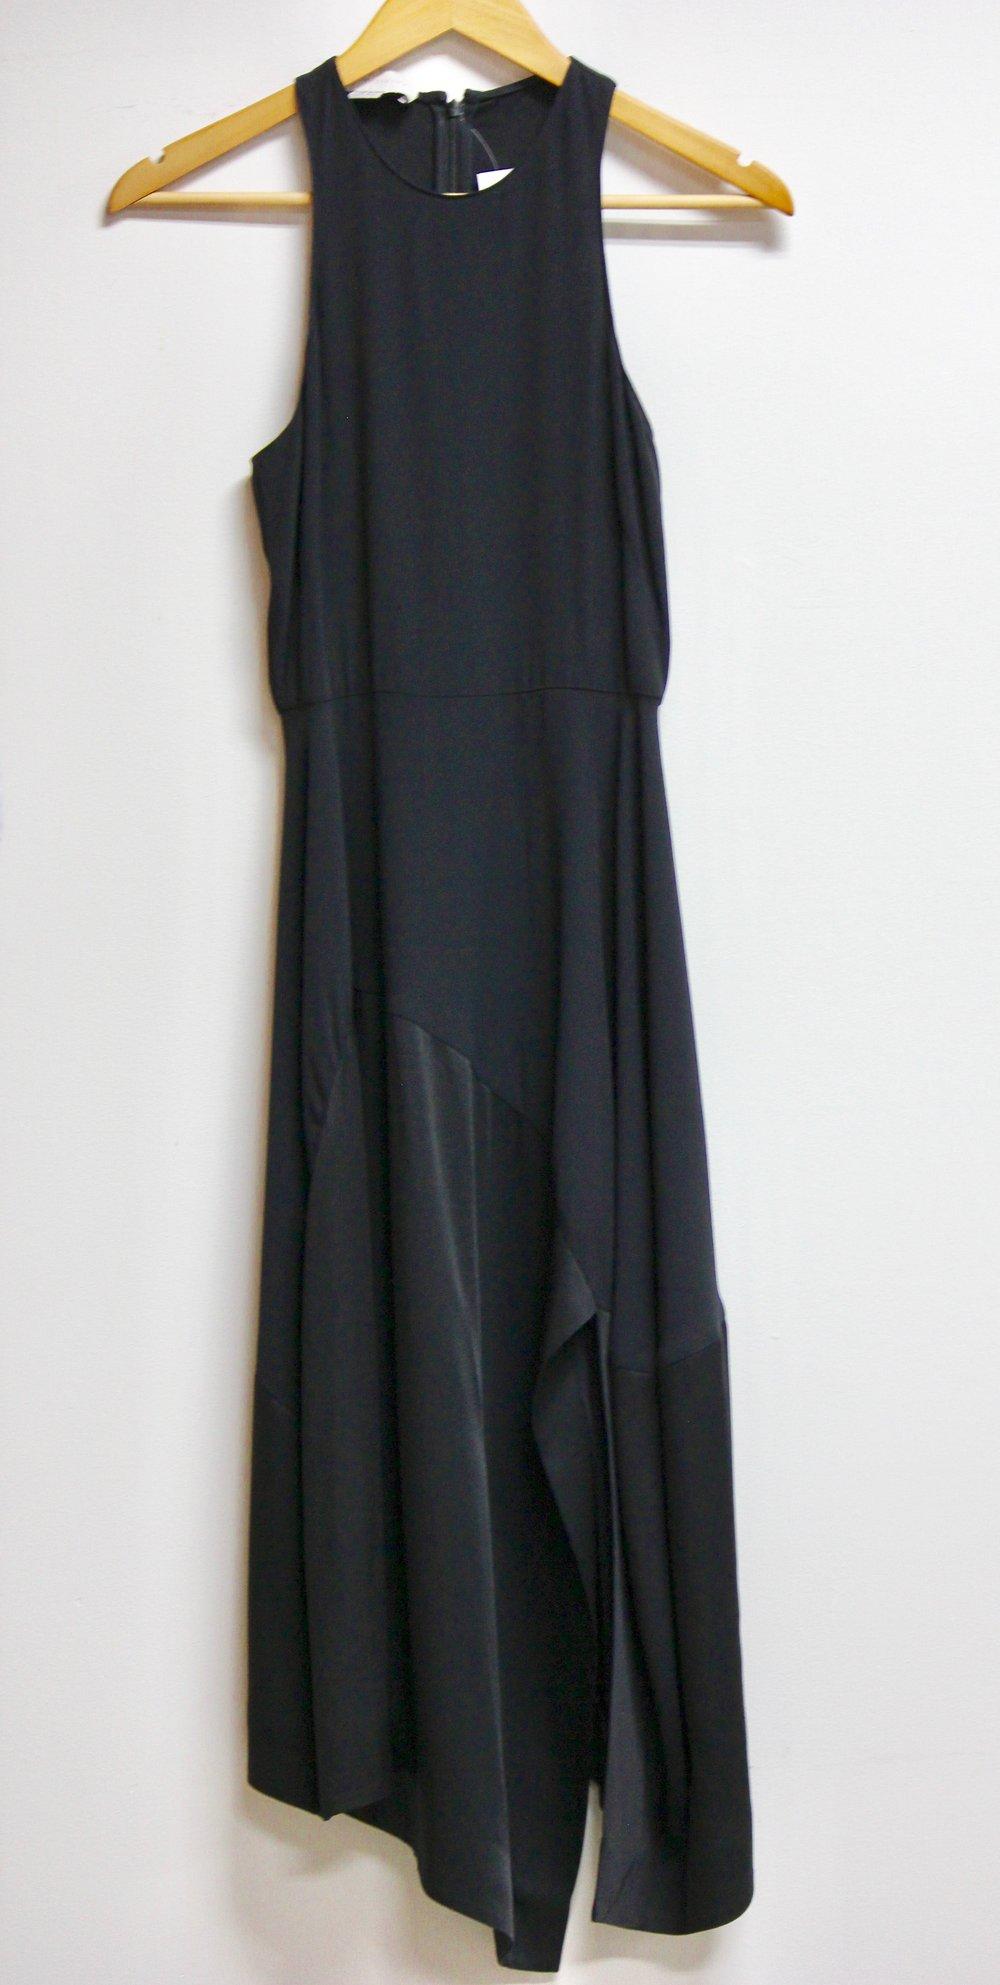 Stella McCartney Assymetrical Dress